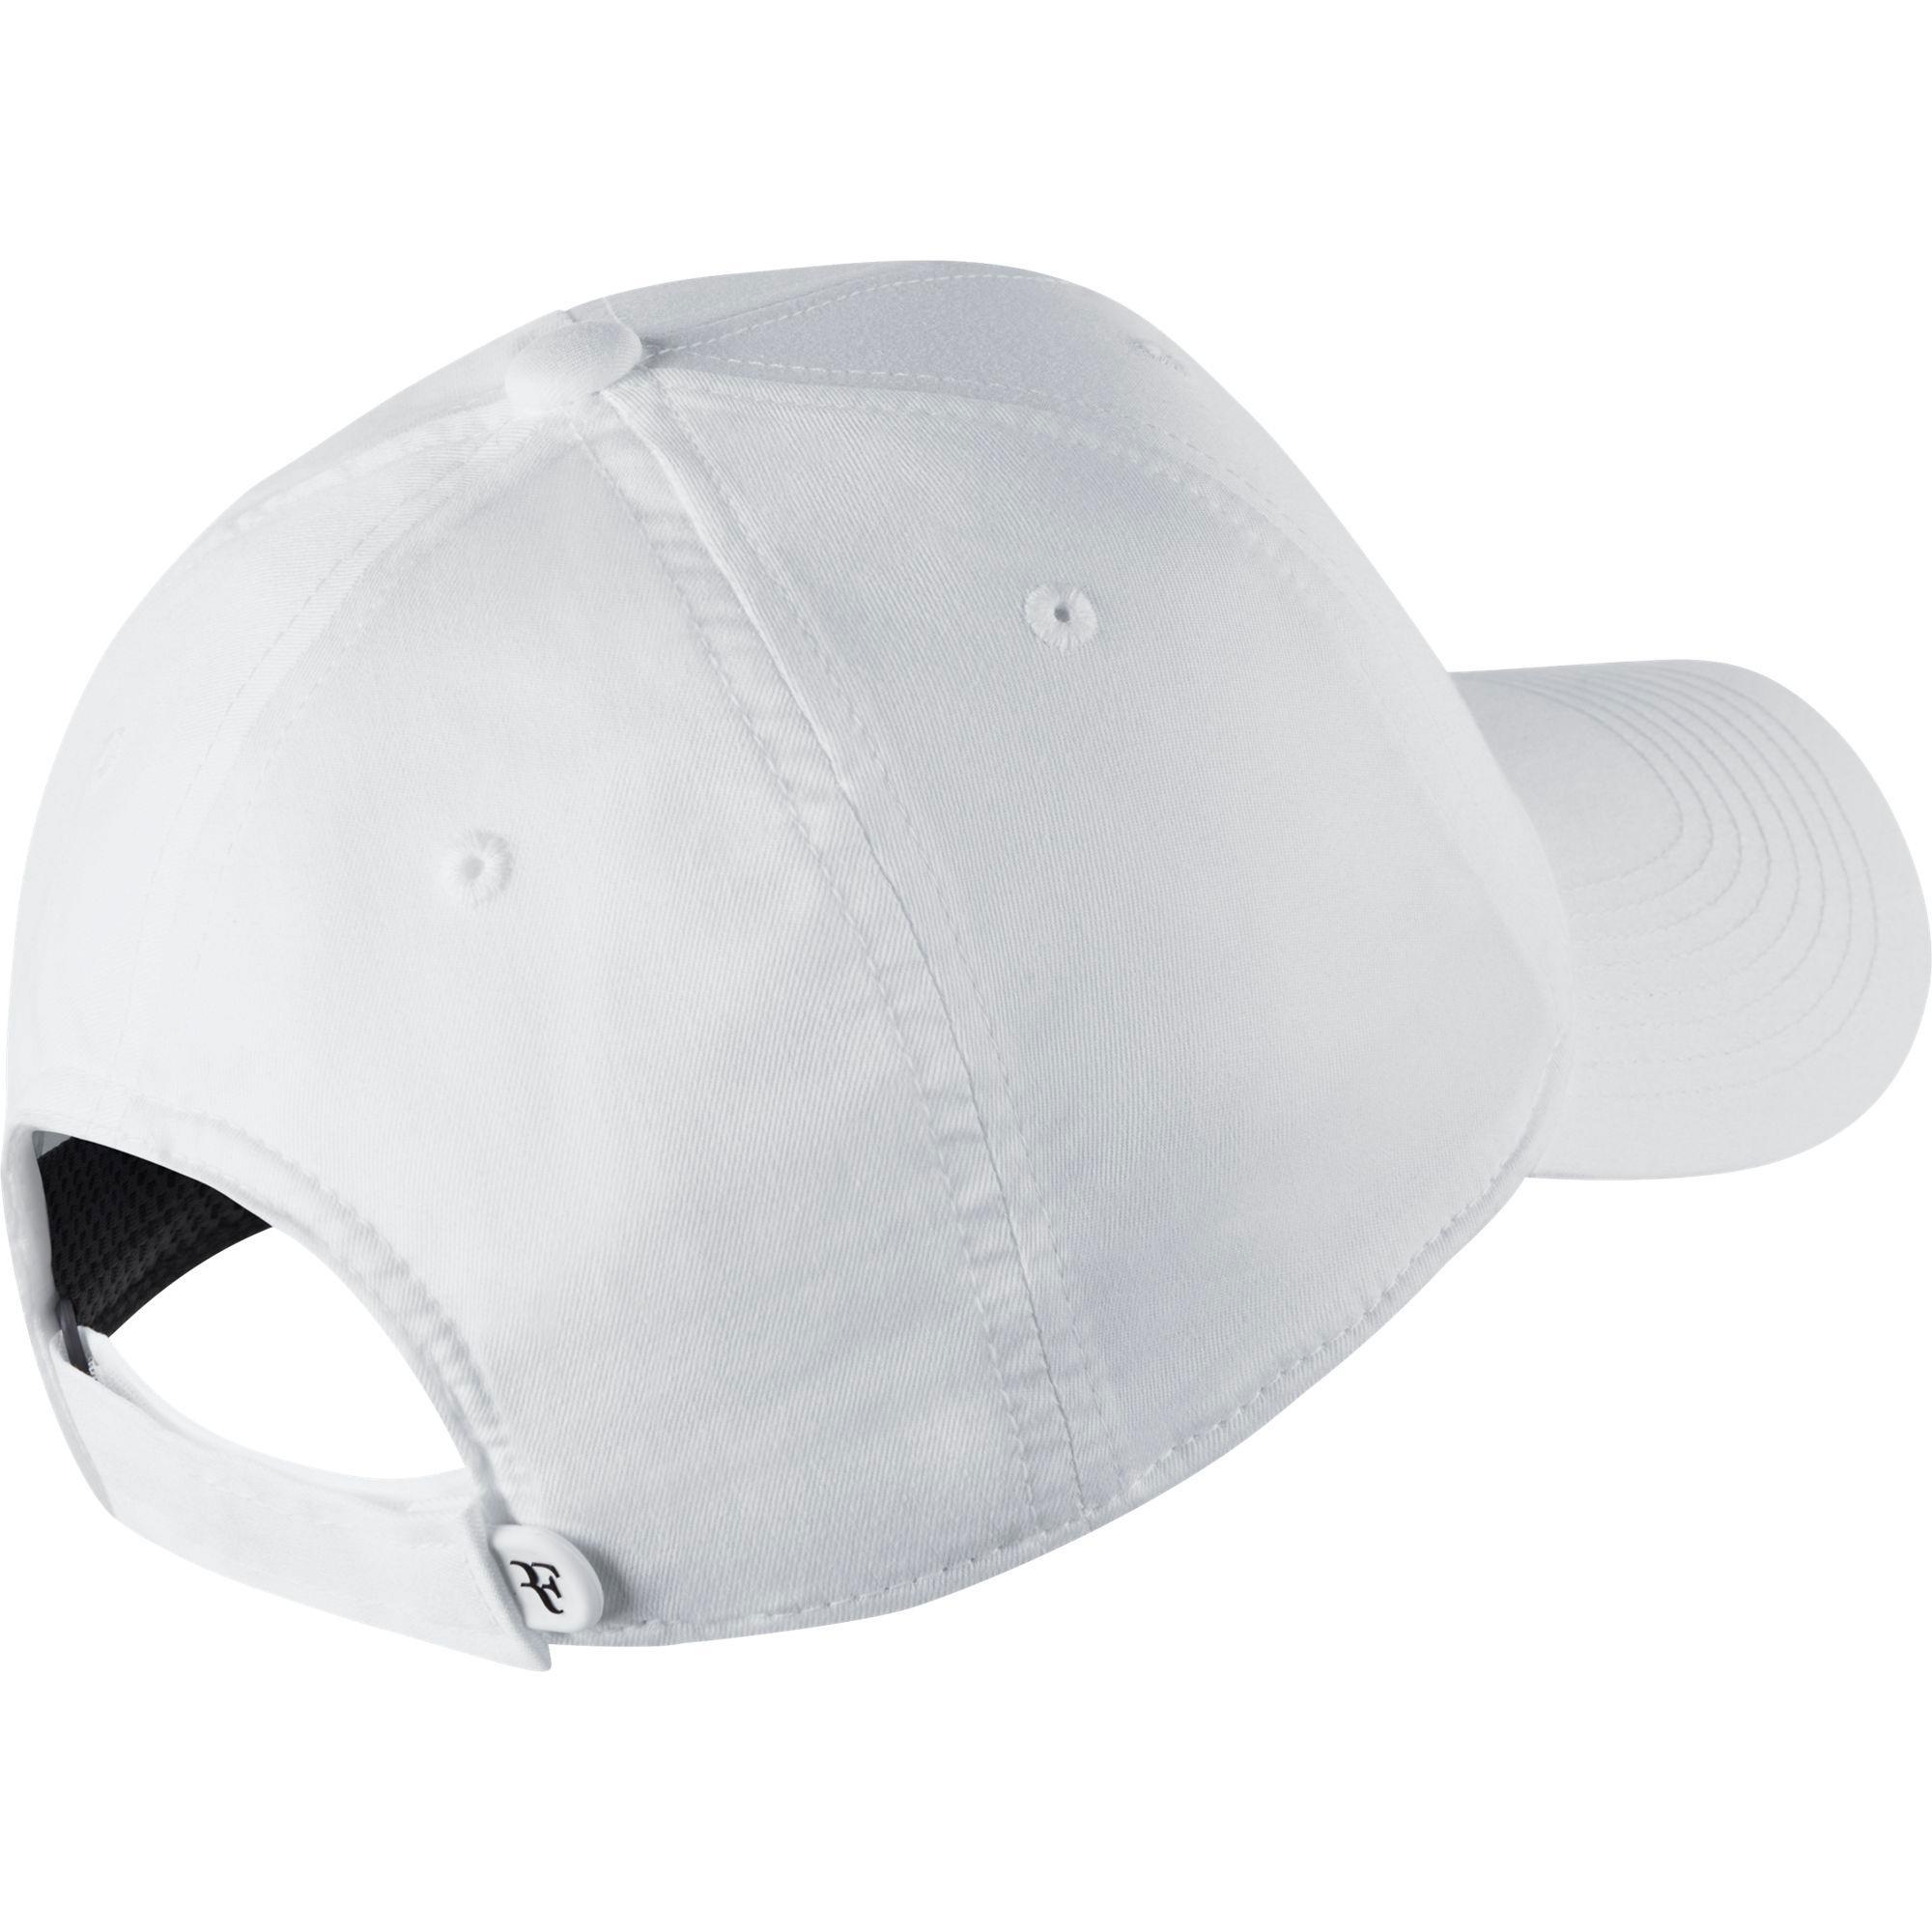 5c7f920b7ff Nike RF Iridescent Cap - White Flint Grey - Tennisnuts.com